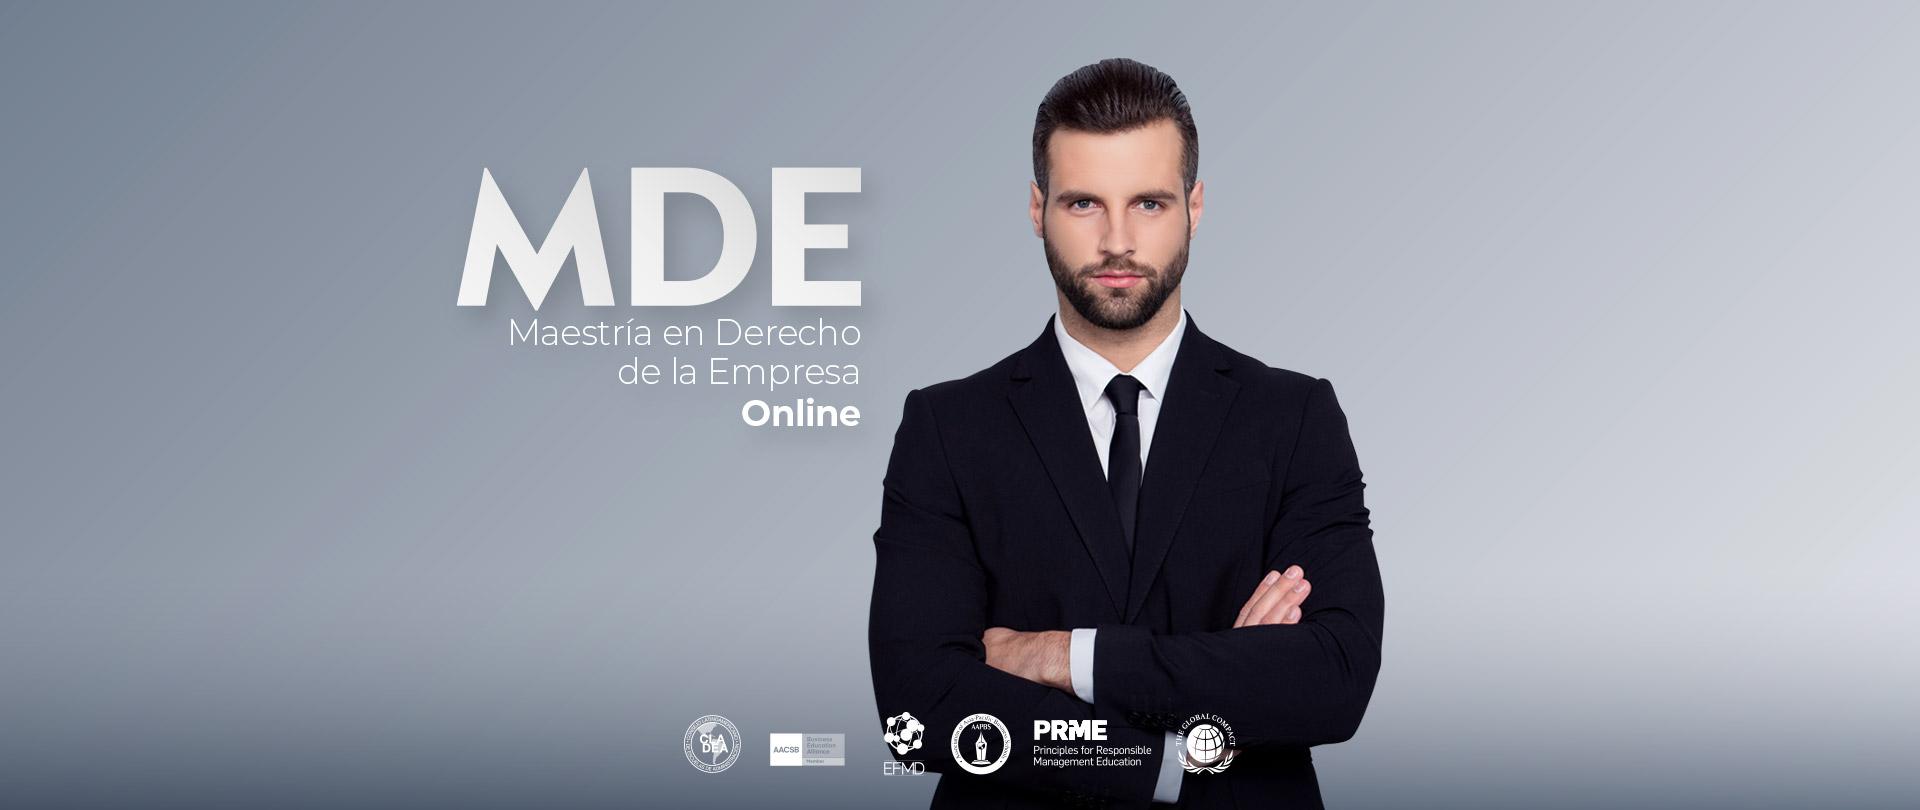 120590_MDE-portada-web1.jpg